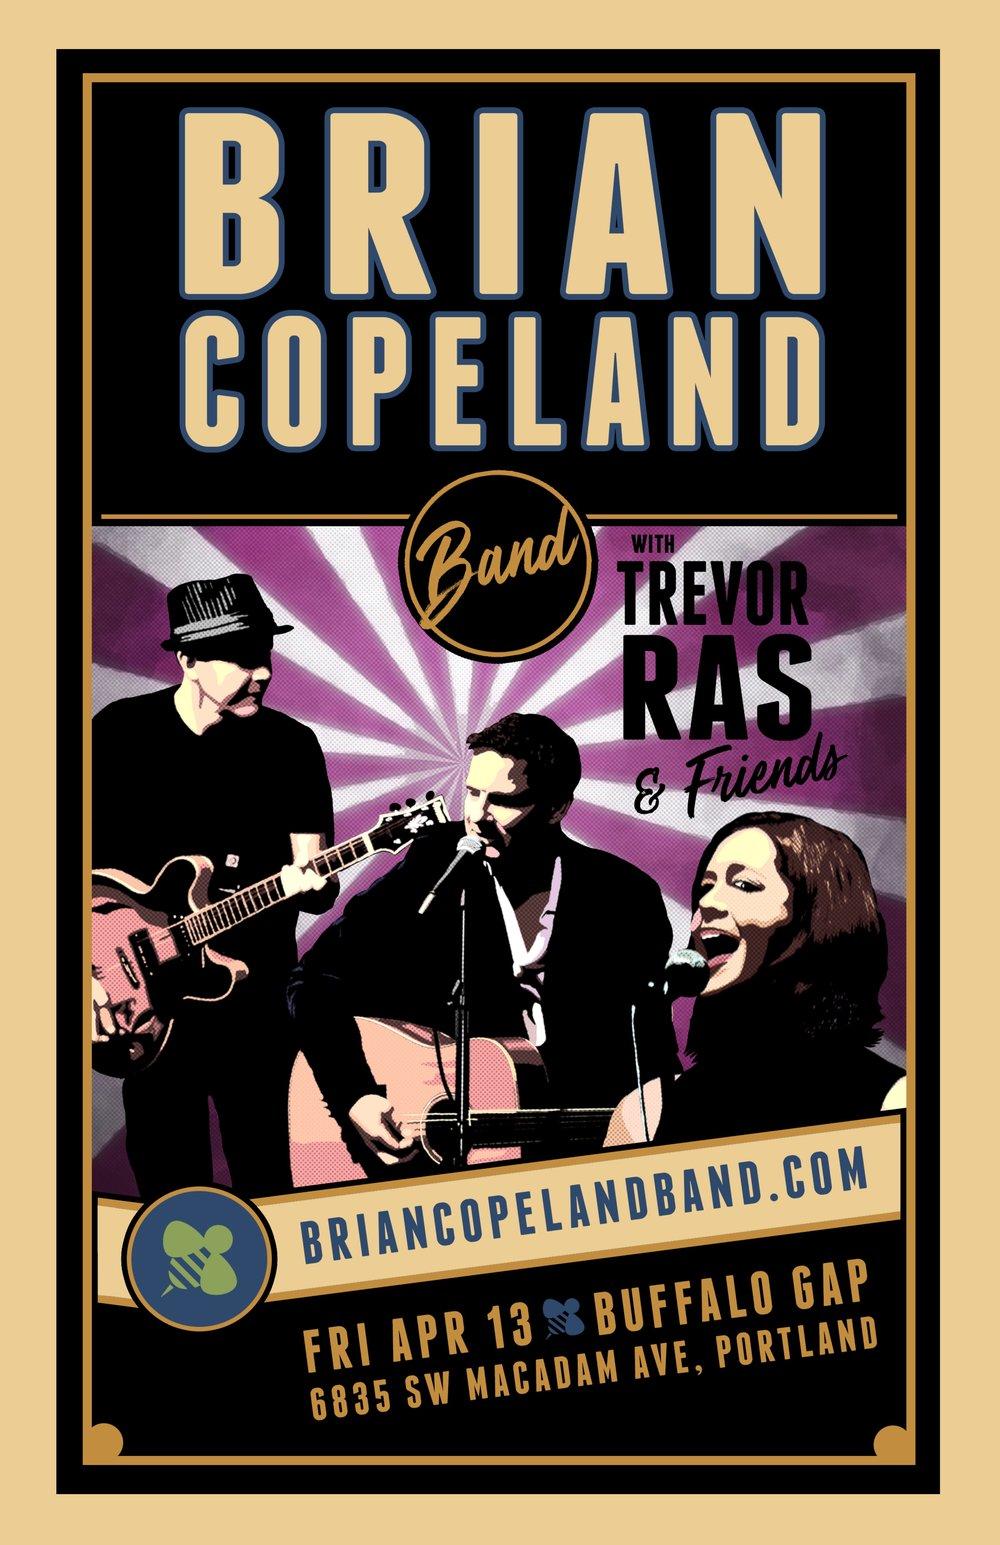 Join Brian Copeland Band and Trevor Ras April 13 Buffalo Gap